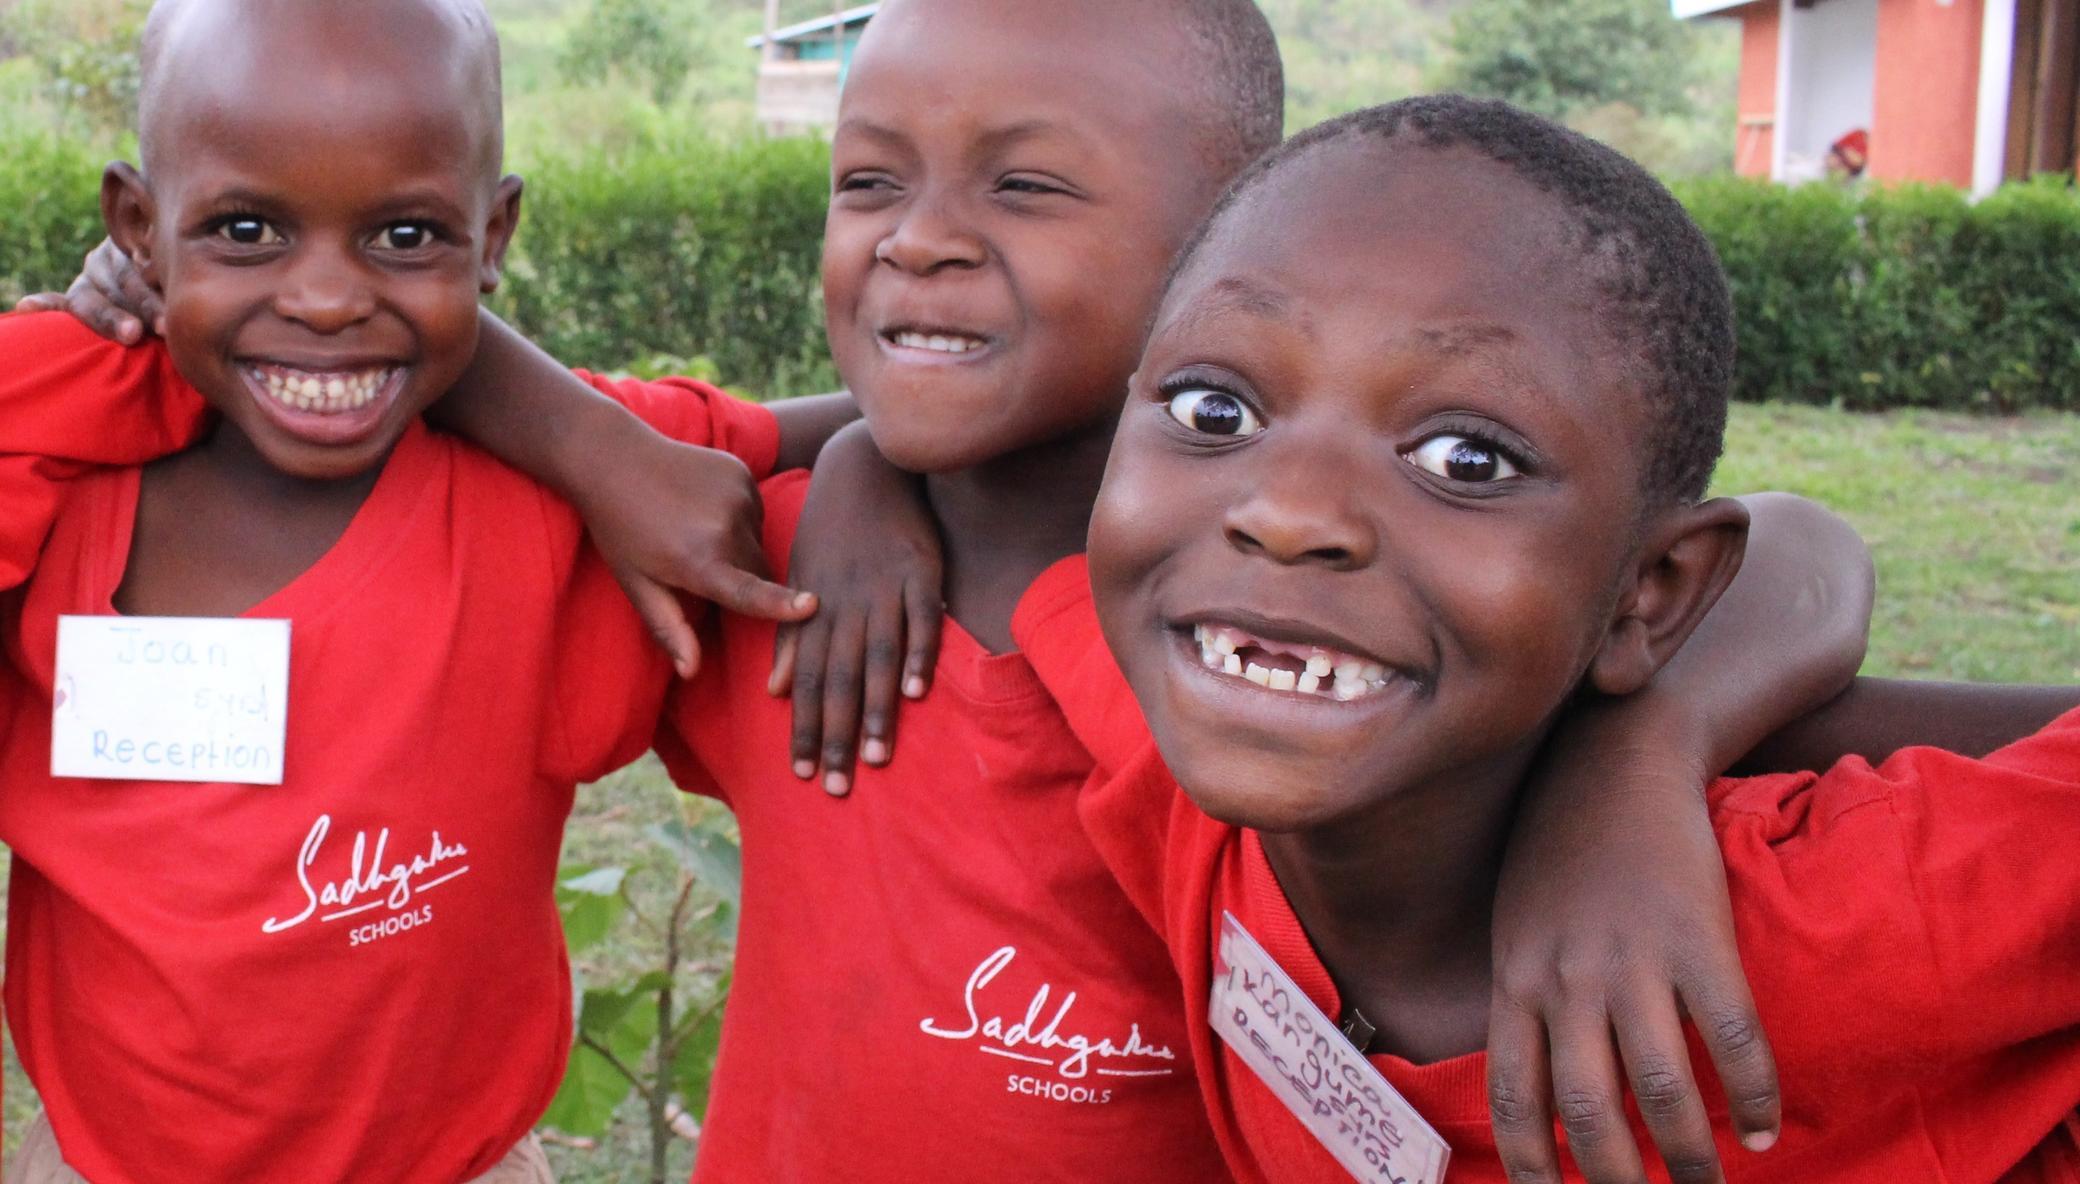 Adopt a Child's Education in Rural Uganda